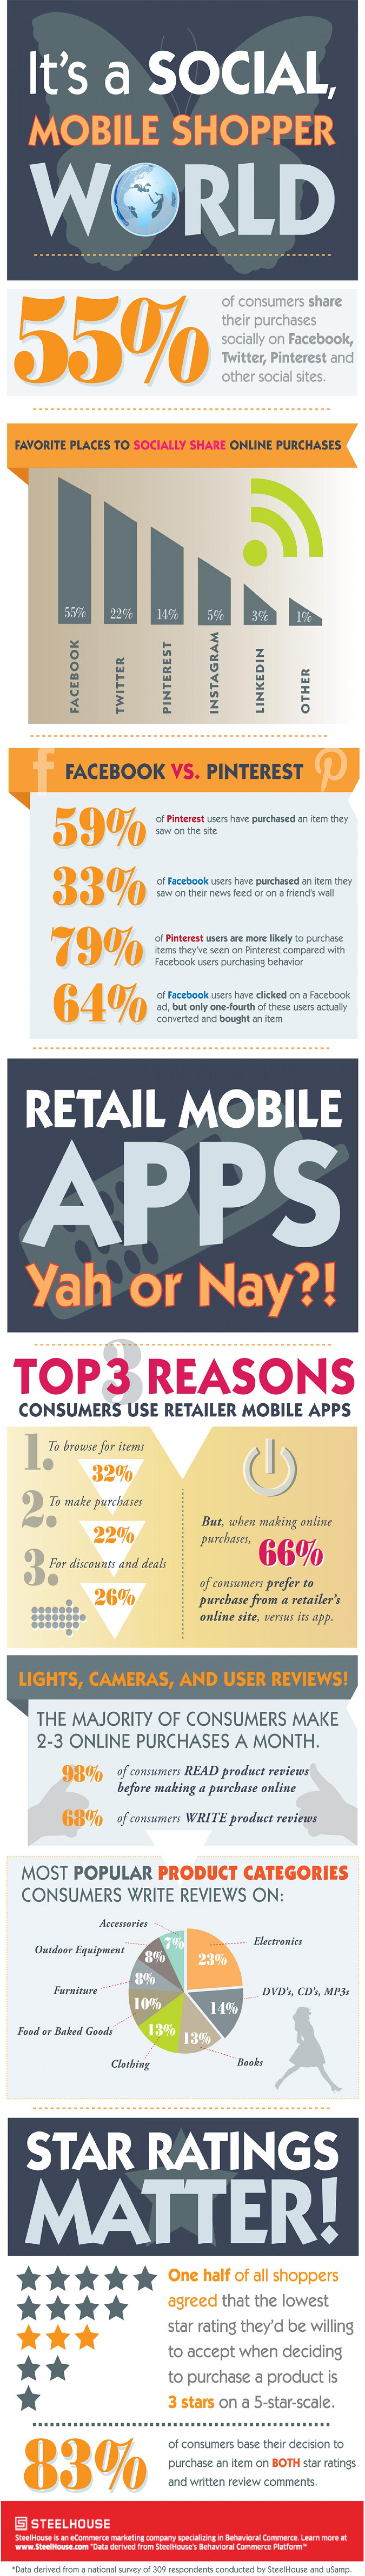 12. It's A Social, Mobile Shopper World